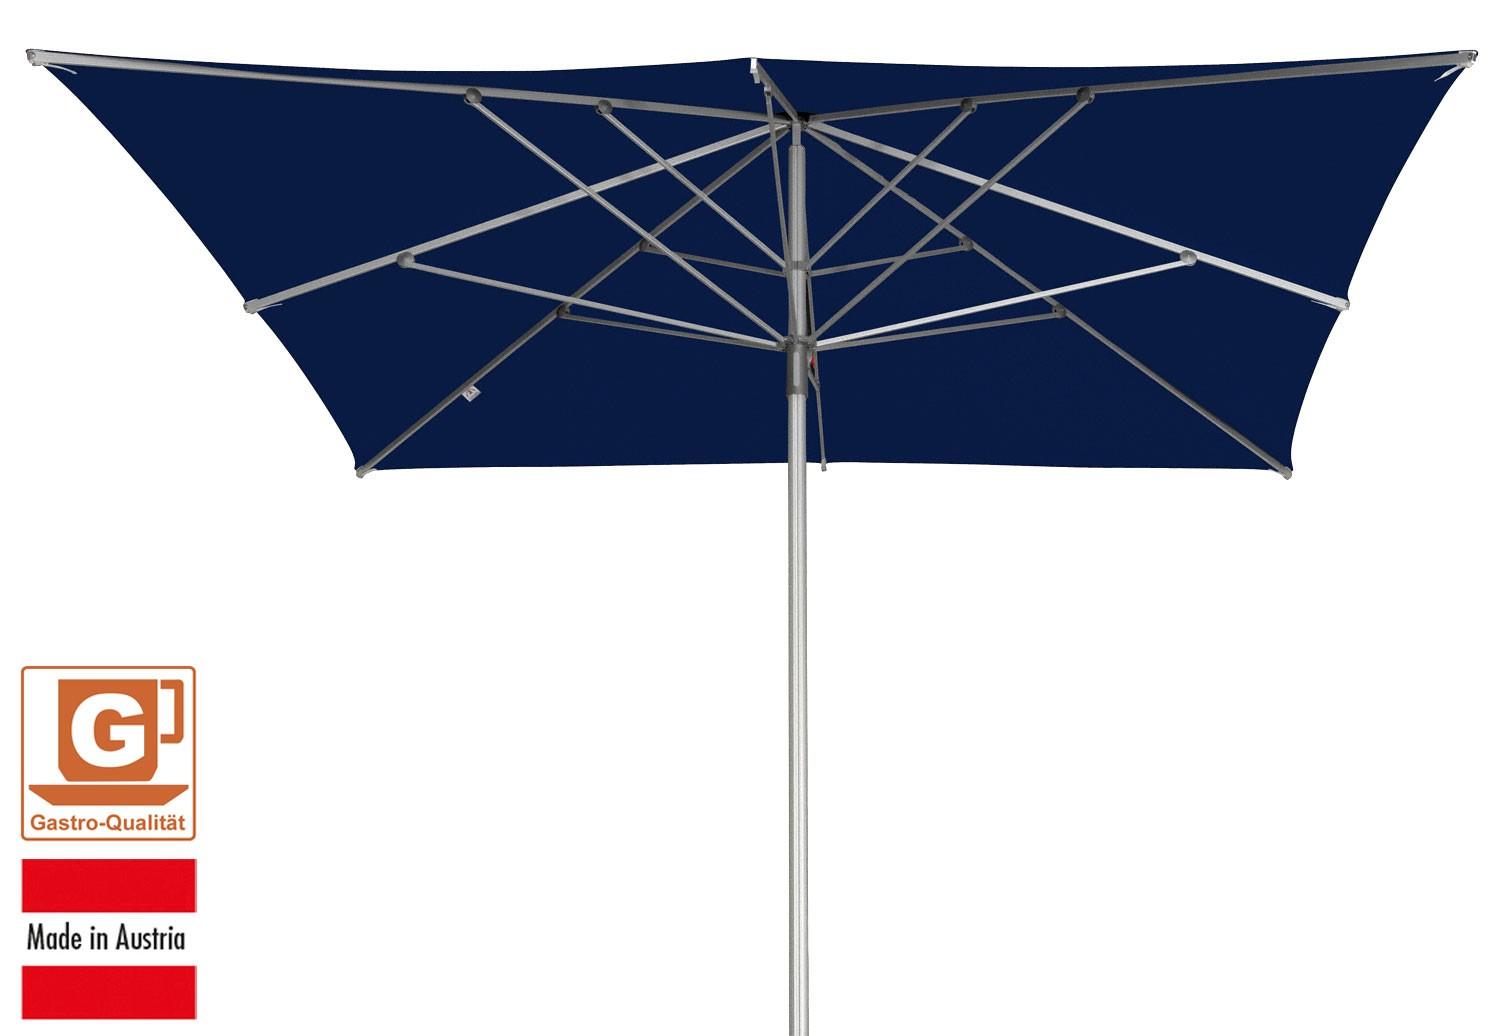 Großschirm / Sonnenschirm Doppler Alu Expert 350x350cm dunkelblau Bild 1